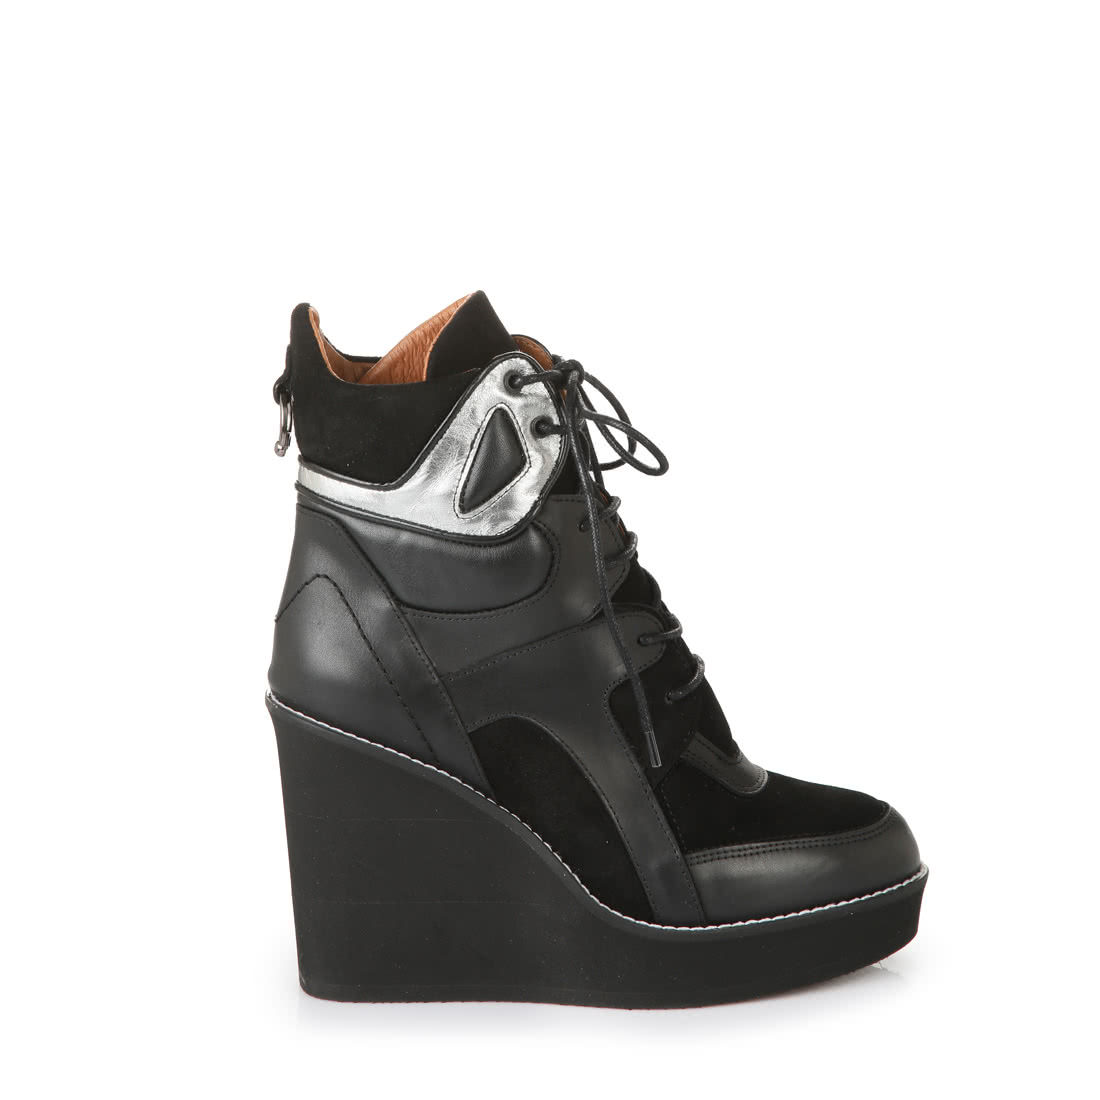 Buffalo Keil Stiefelette in schwarz metallic online kaufen